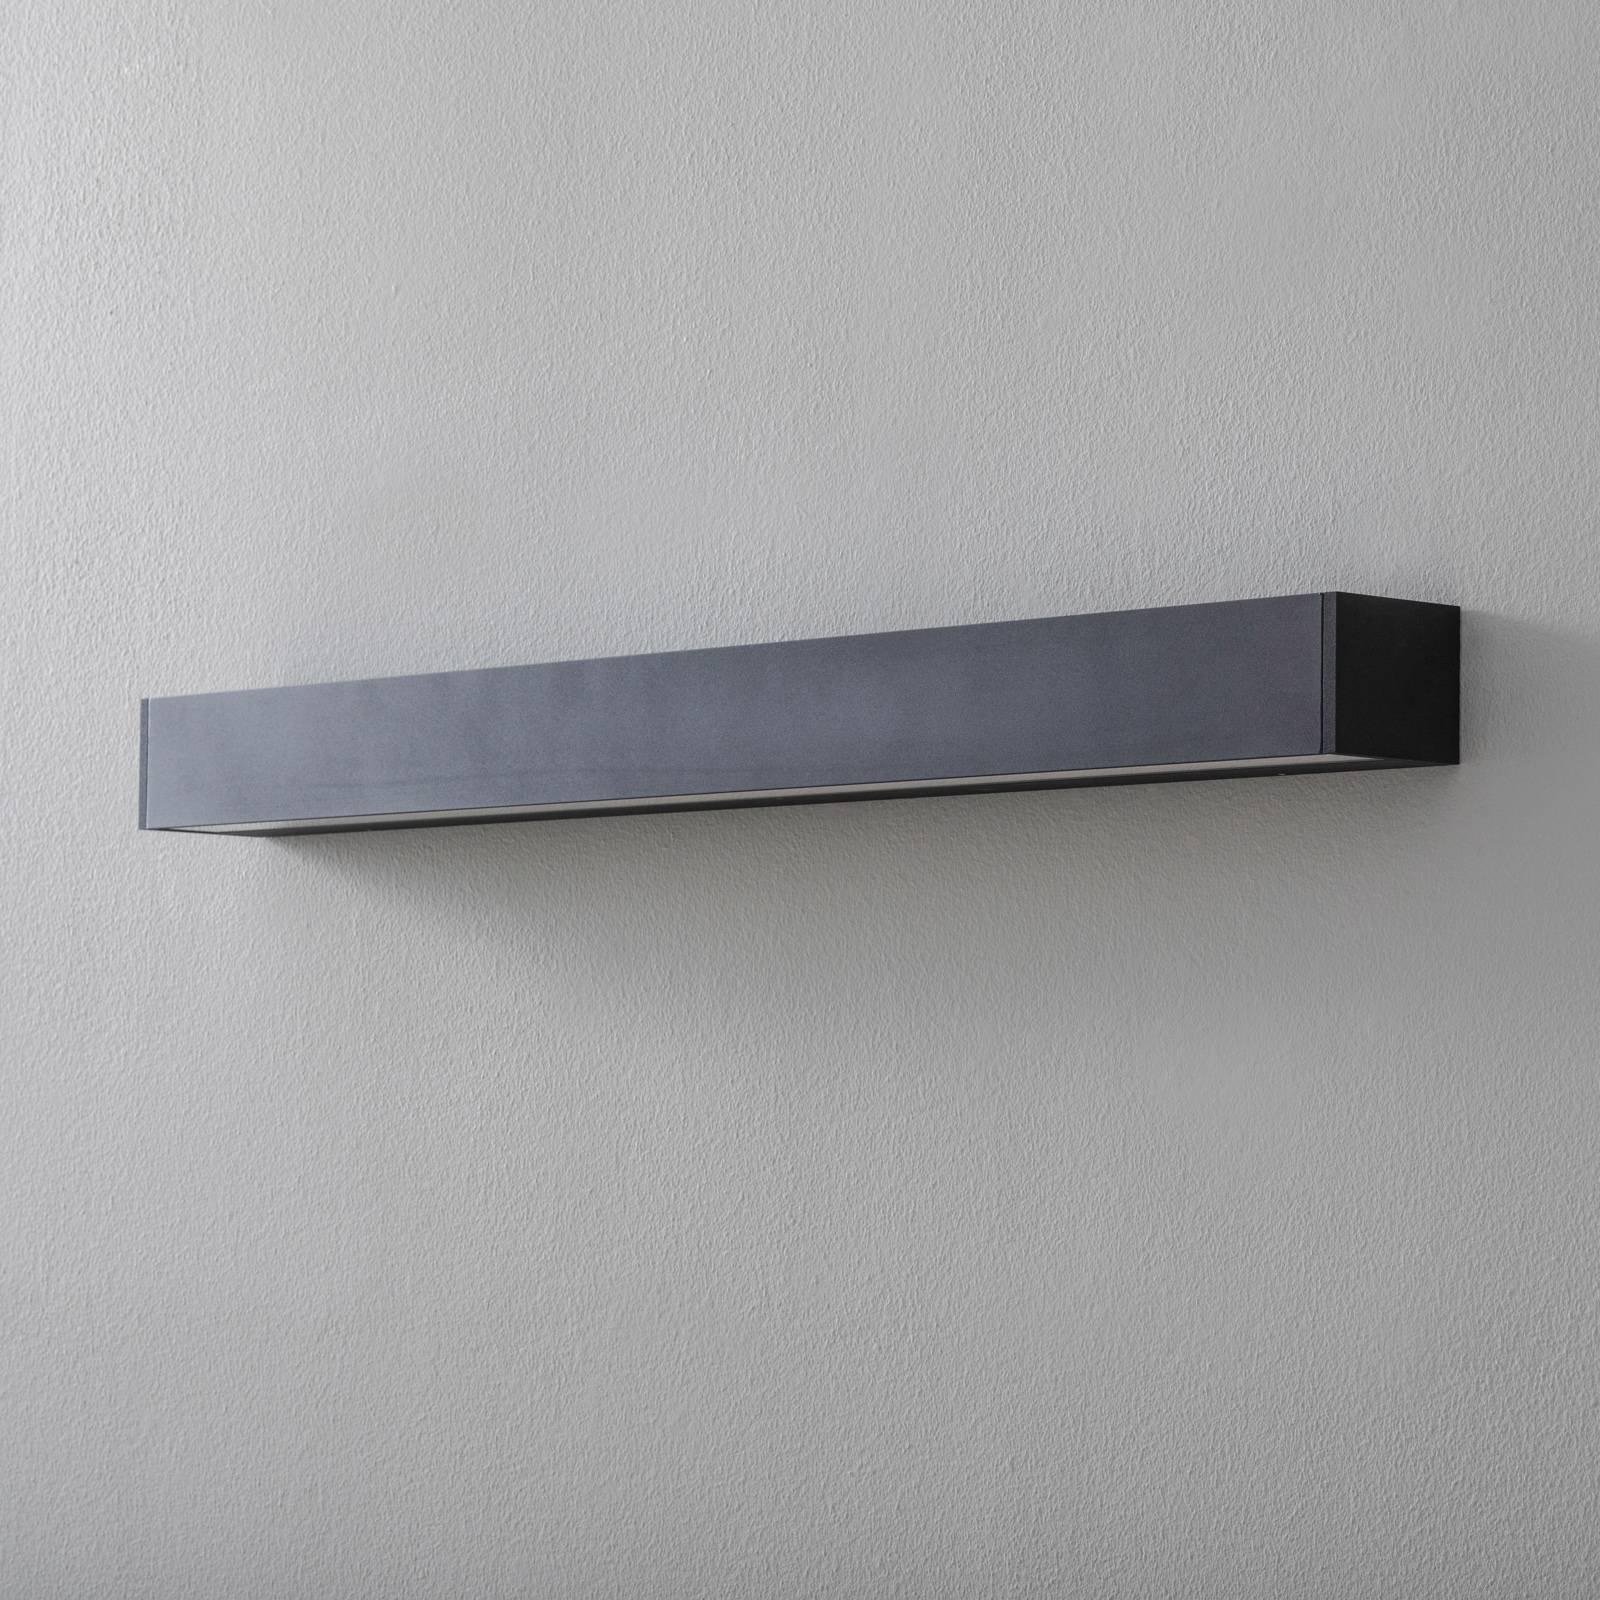 BEGA 50805 LED-vegglampe 930 svart 92 cm 9270 lm